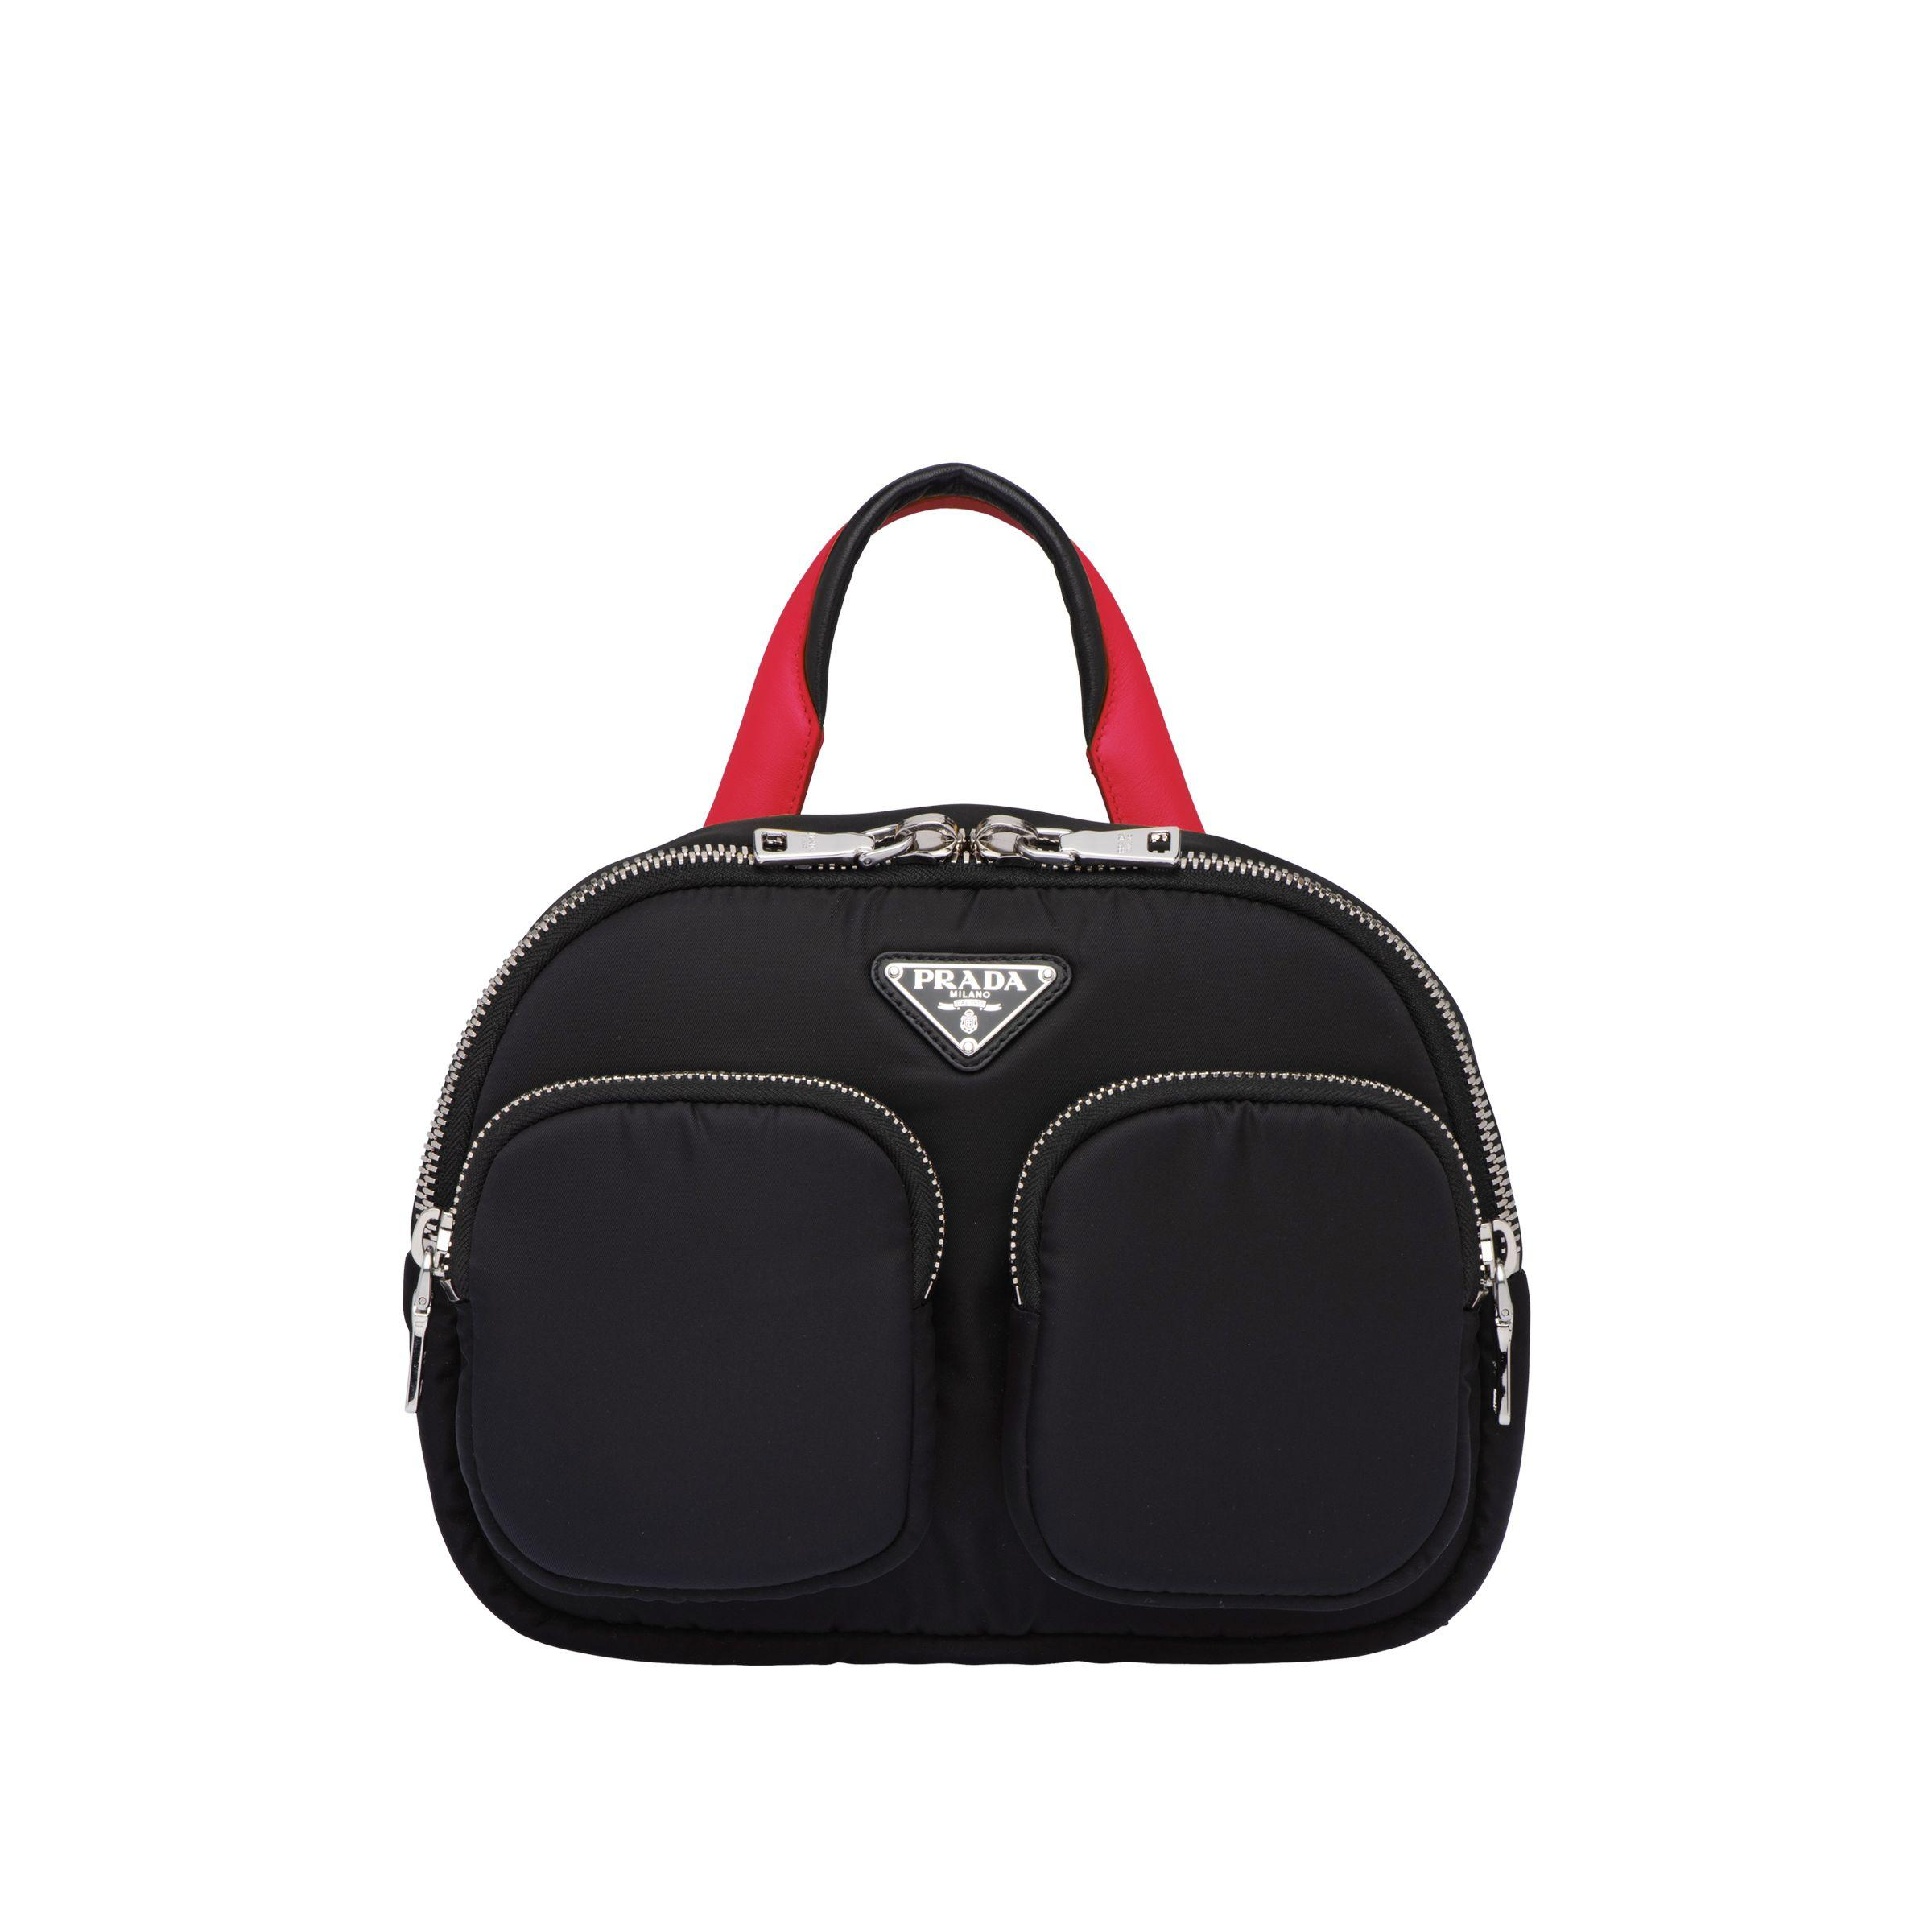 3cce8531d4a2 Prada - Black Padded Nylon Backpack - Lyst. View fullscreen